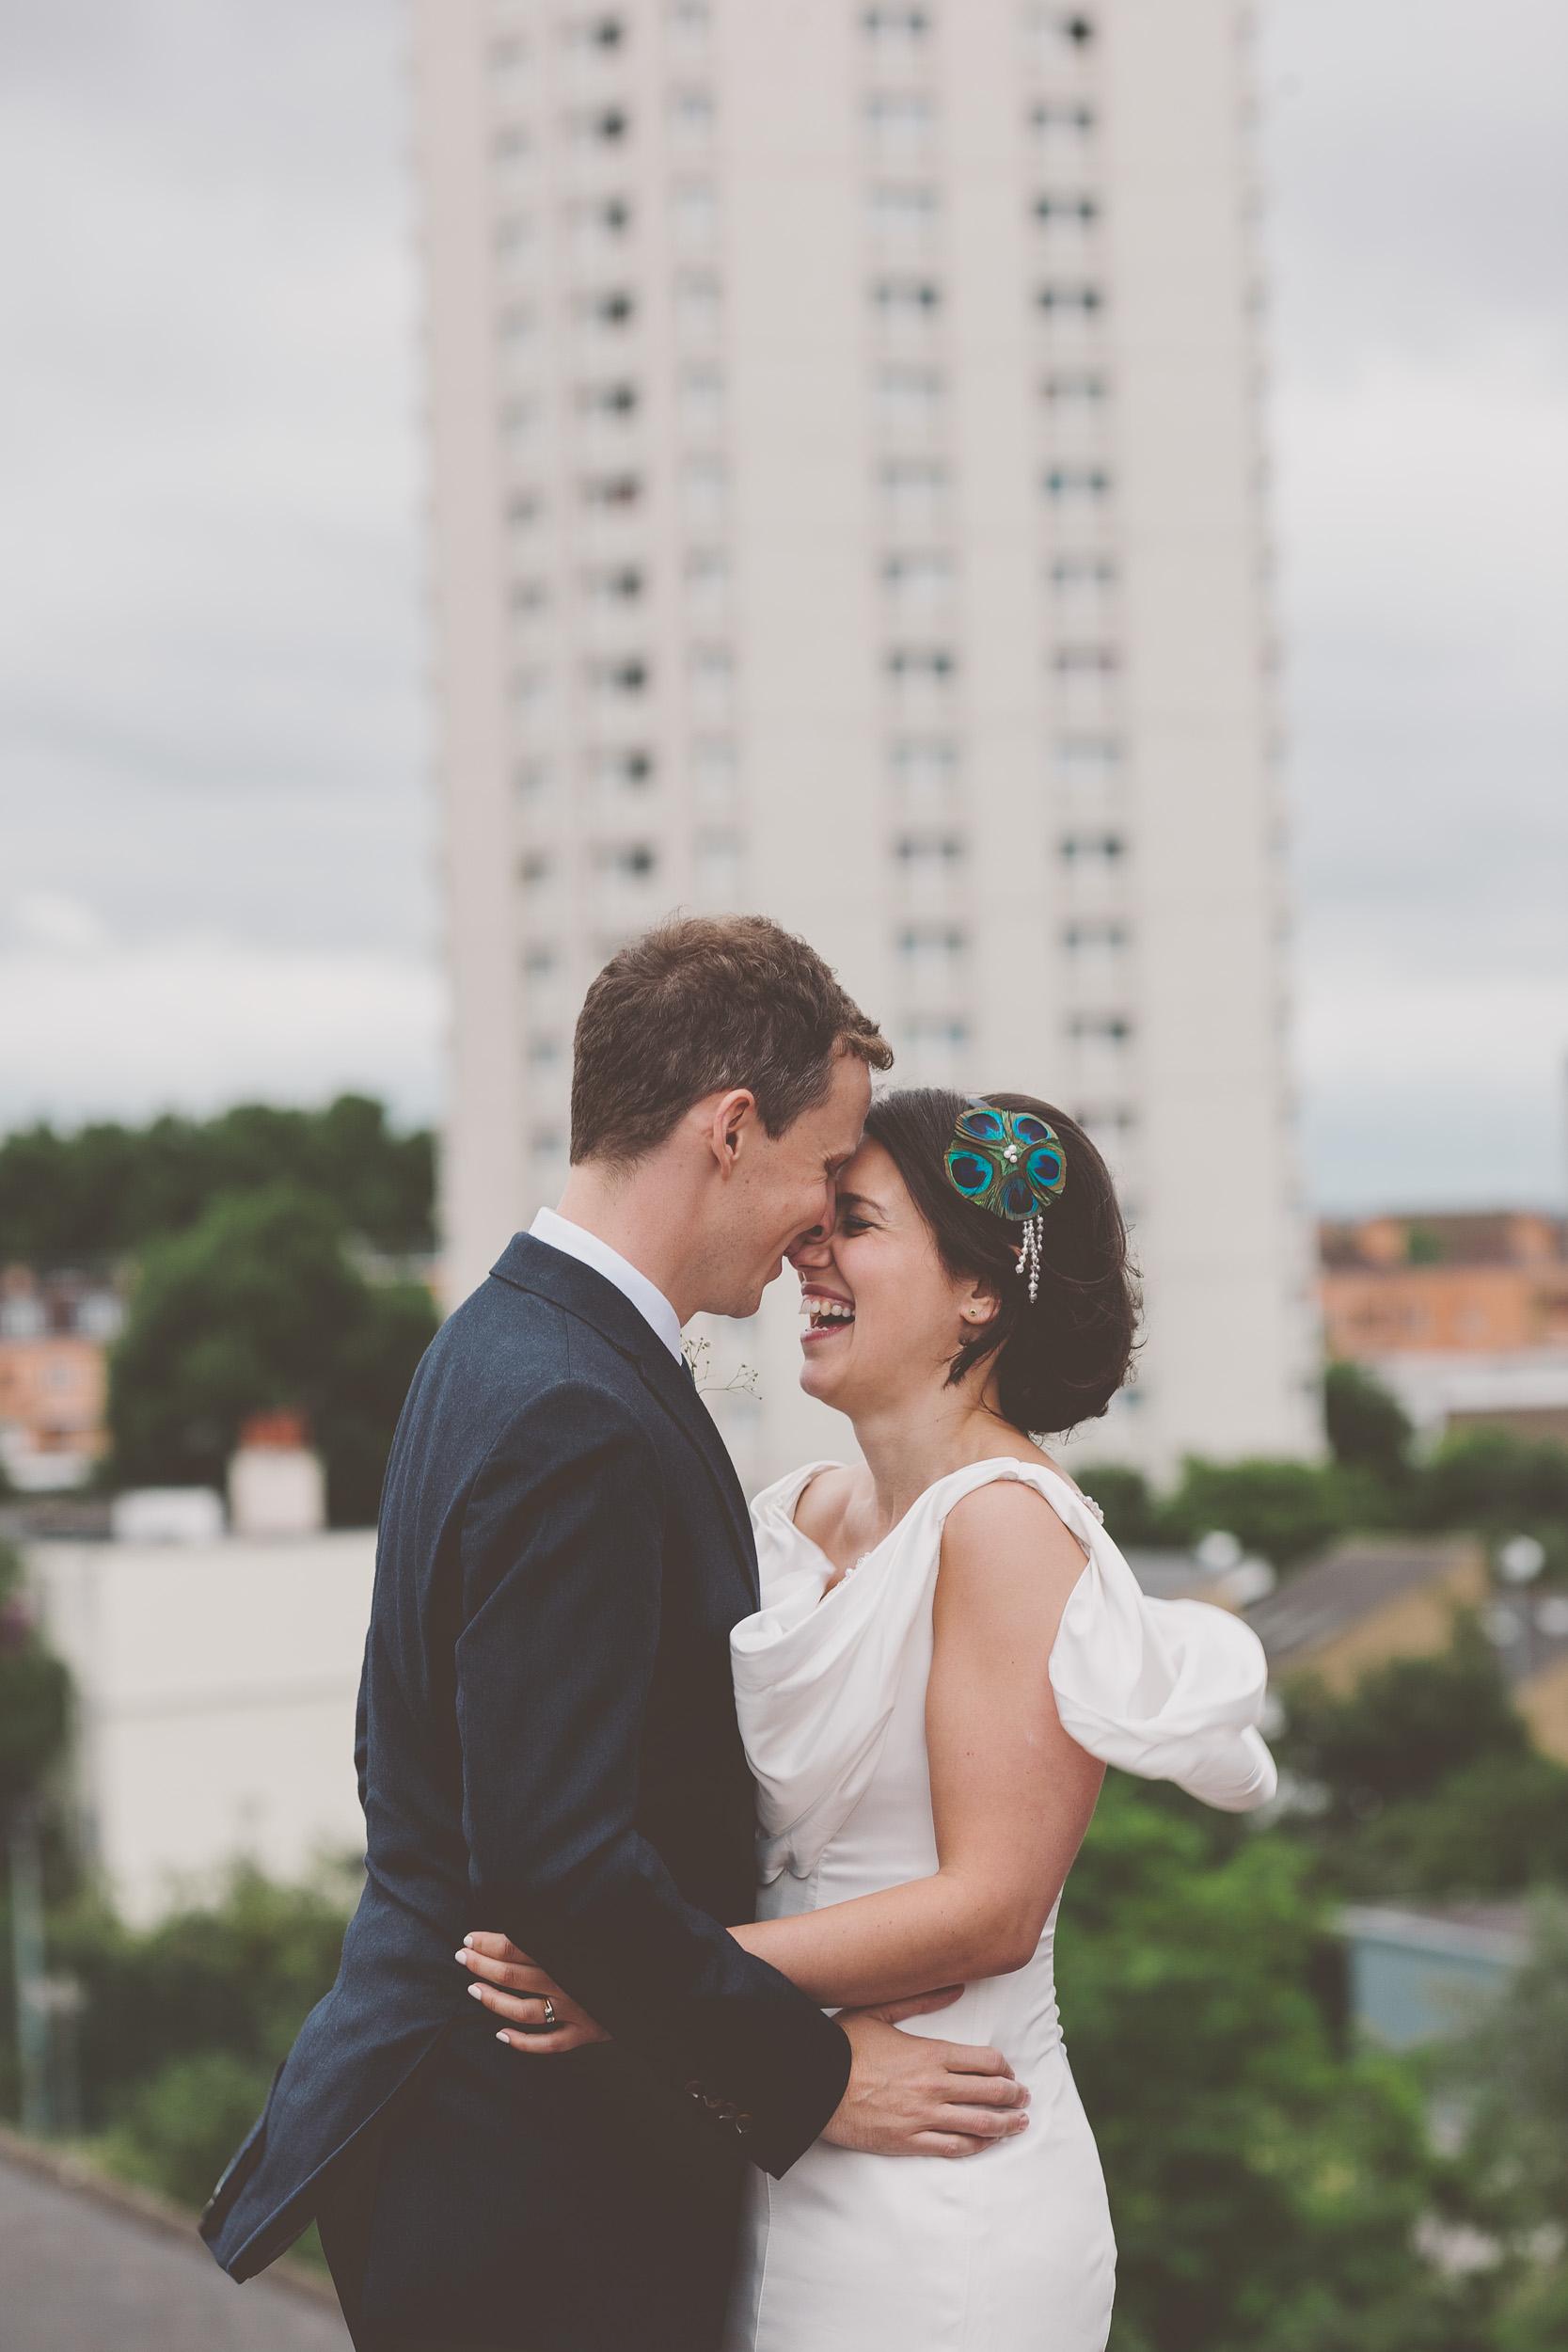 islington-town-hall-4th-floor-studios-wedding285.jpg